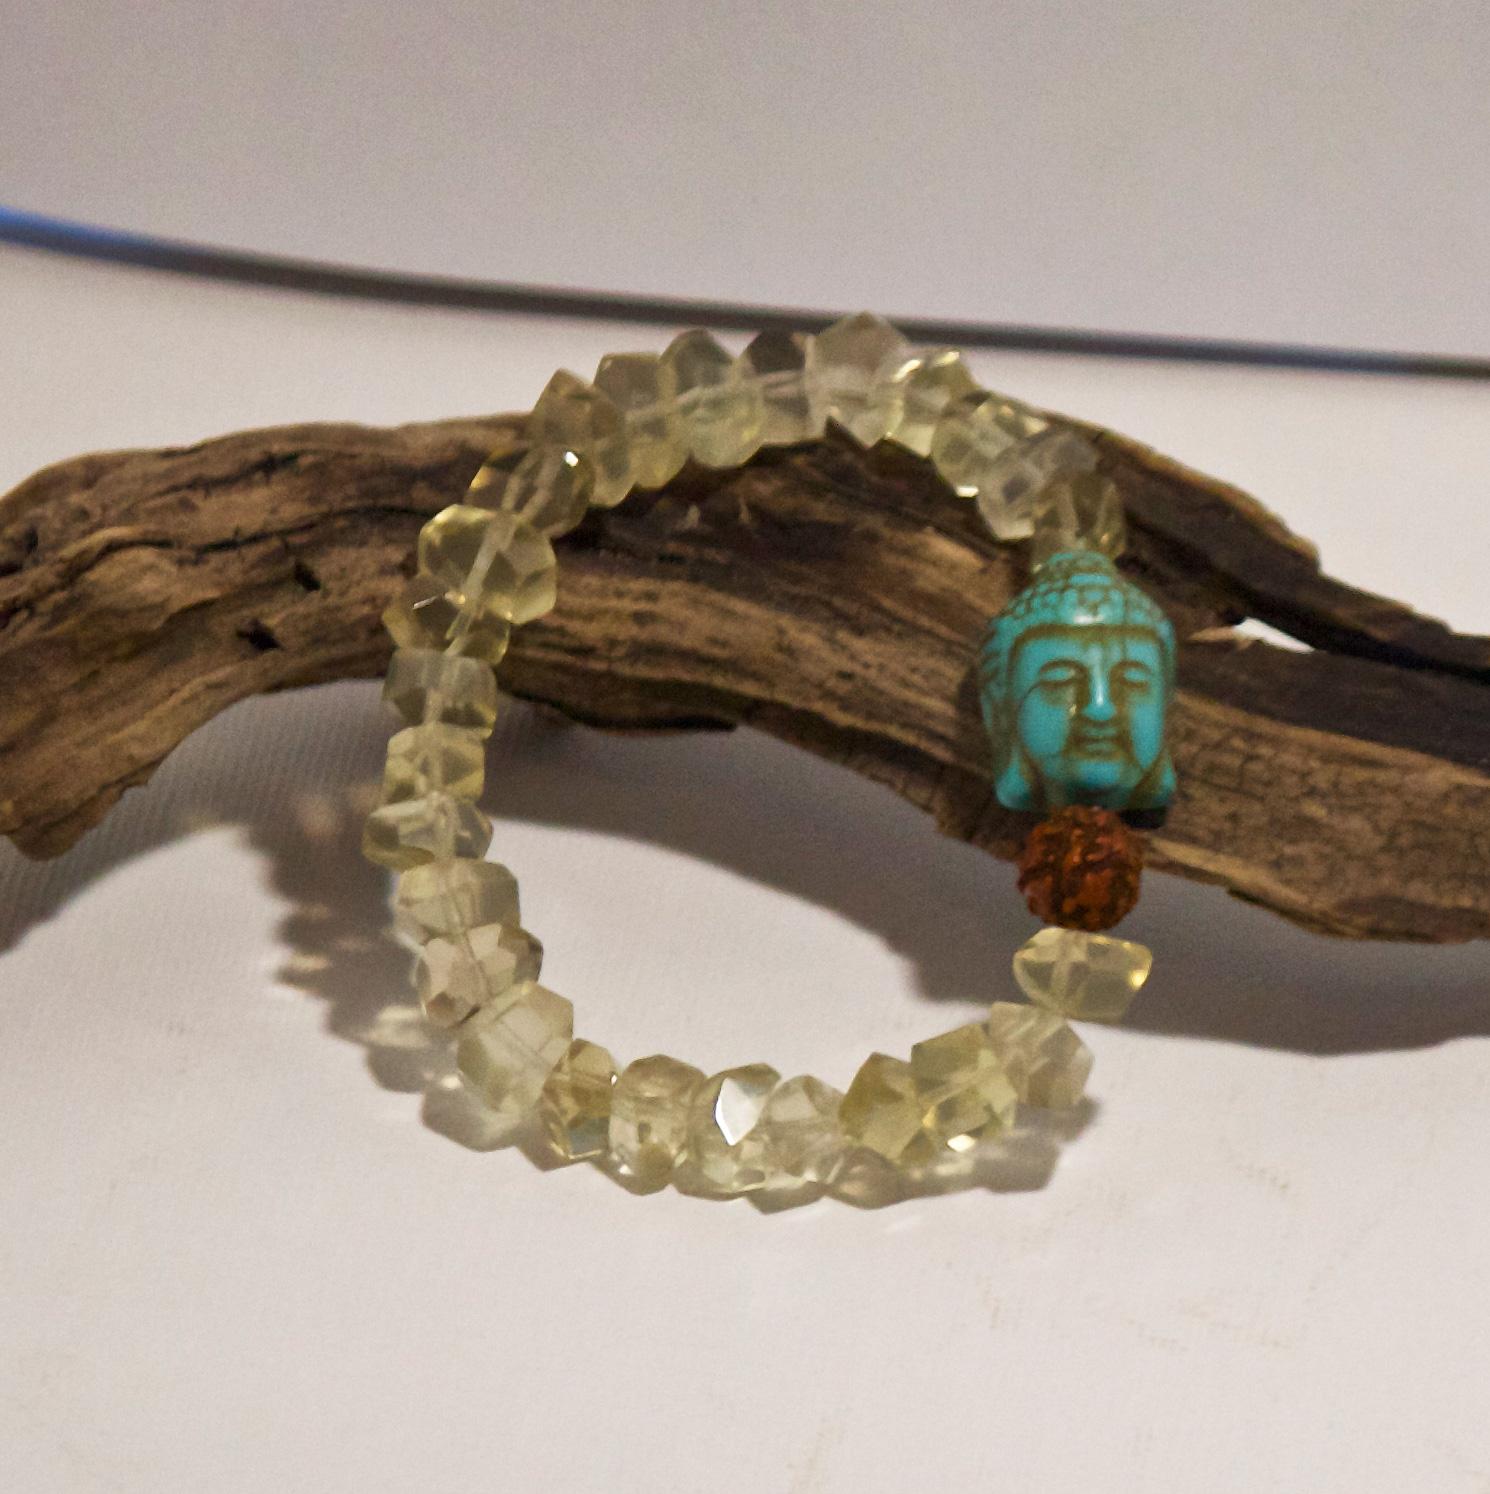 lemon-quartz-wrist-mala-2.jpg